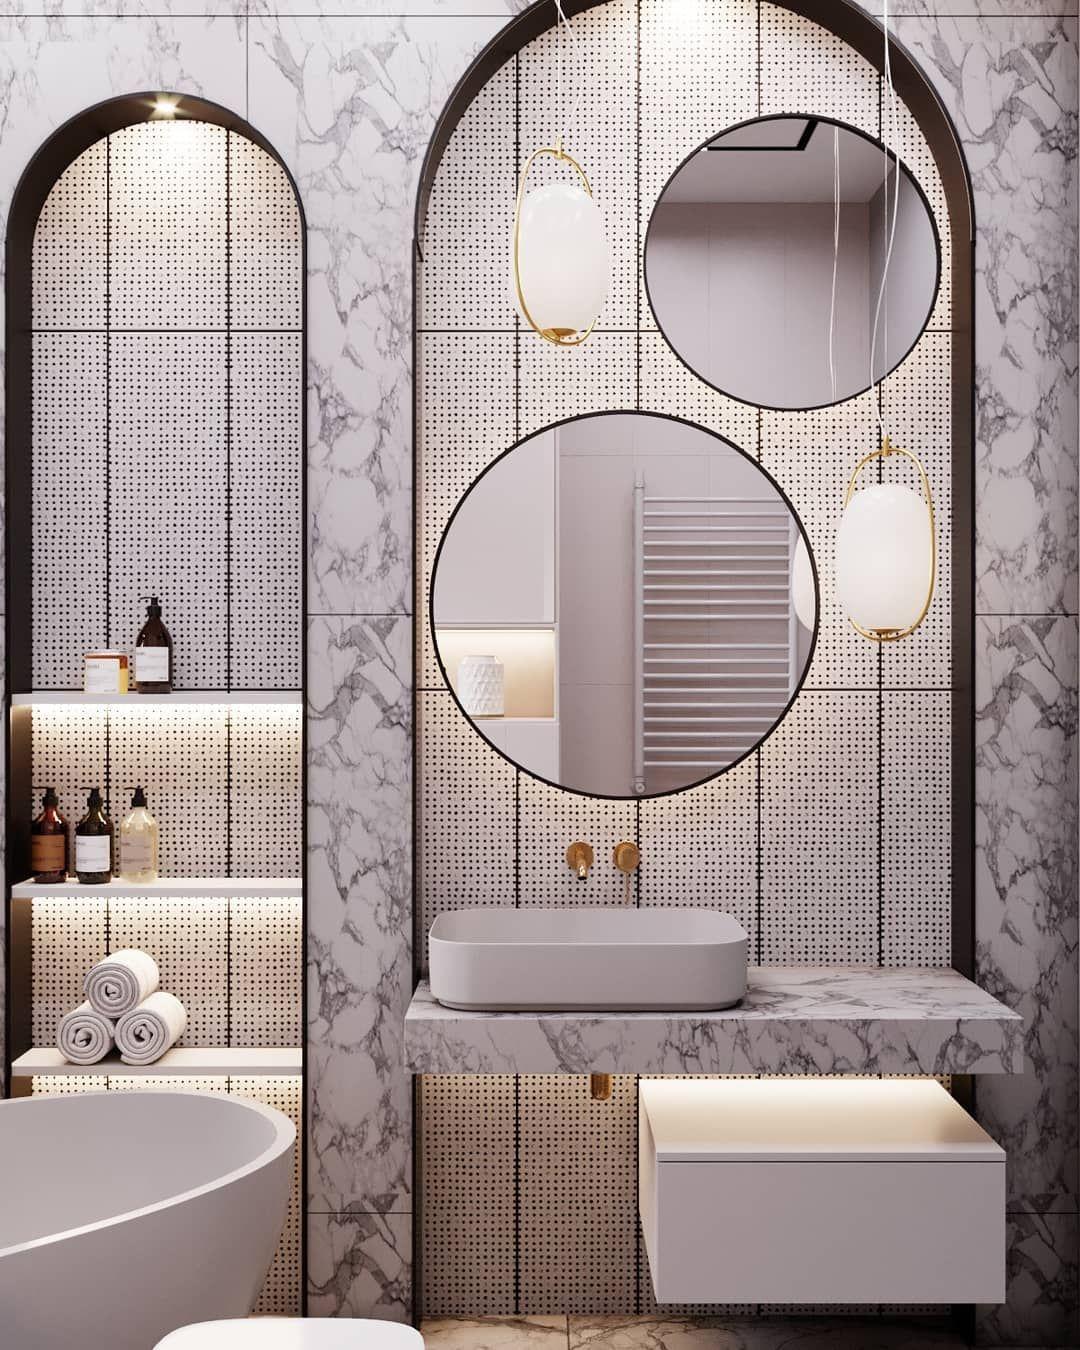 40 Modern Bathroom Decor Ideas Stunning That Will Inspire You To Renovate New 2020 Bathroom Decor Bathroom Design Modern Bathroom Decor Bathroom design ideas 2021